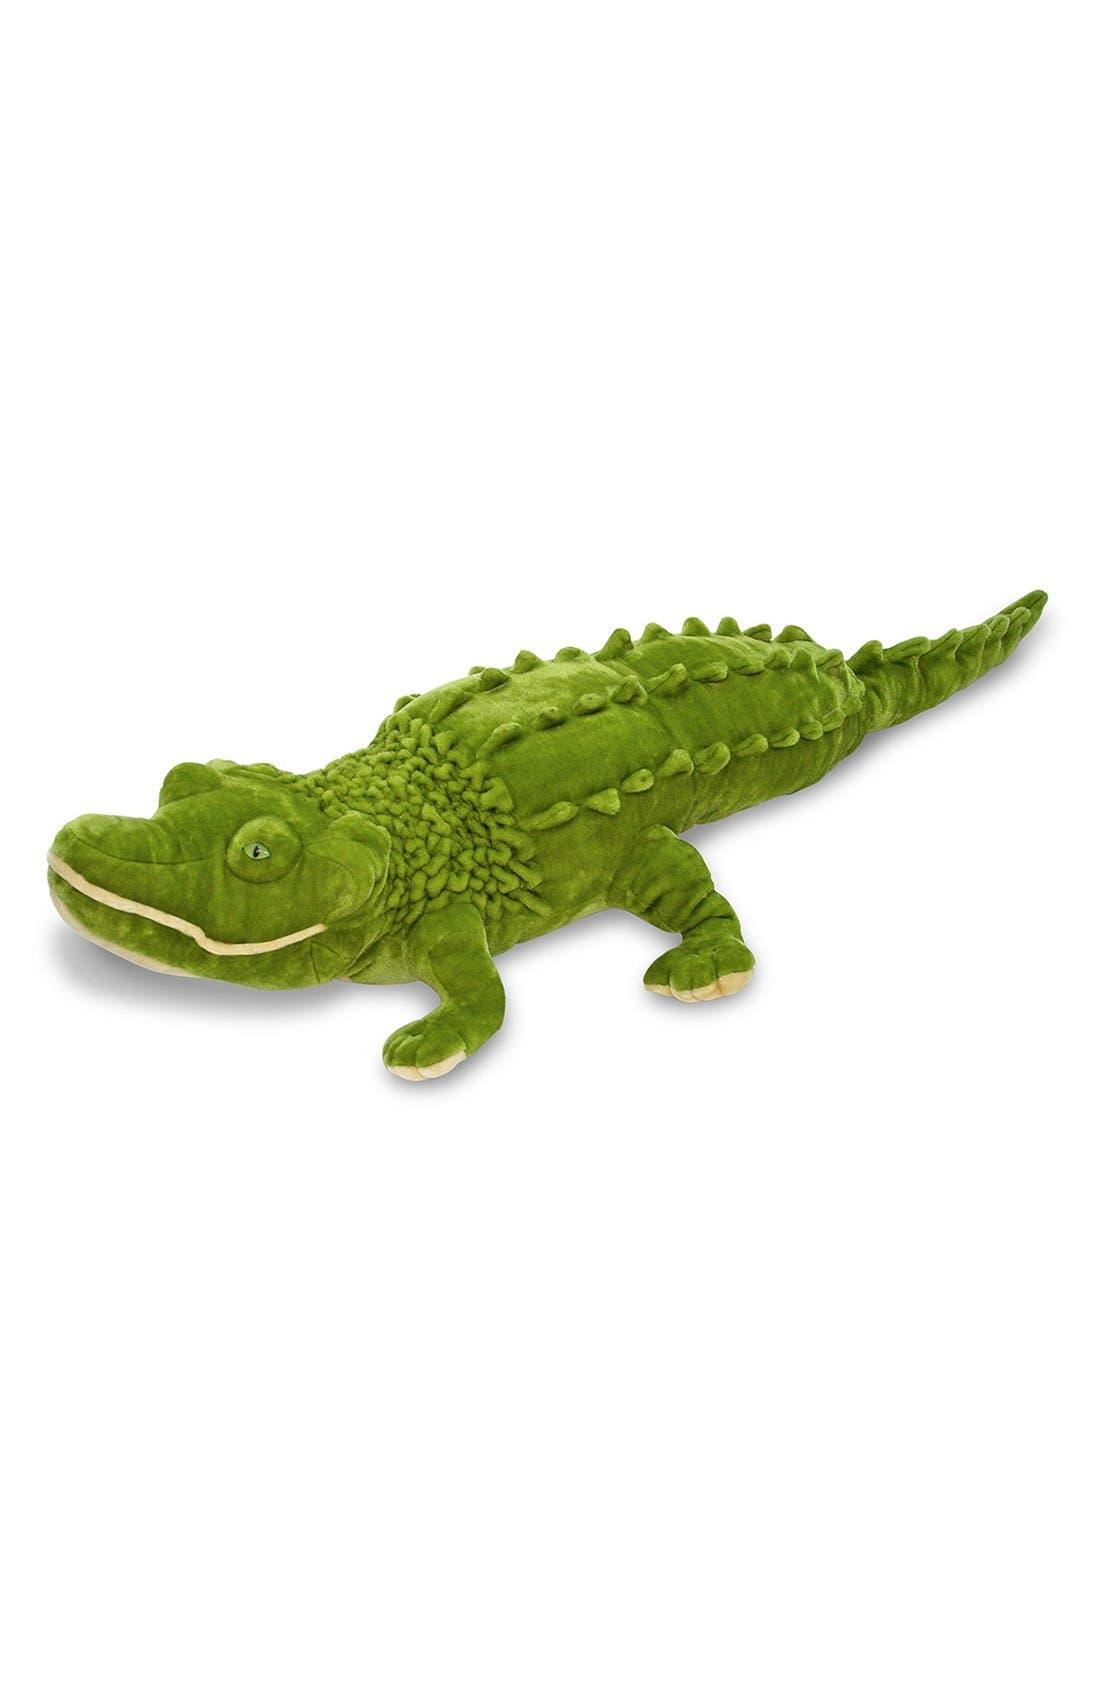 Oversized Alligator,                             Main thumbnail 1, color,                             300